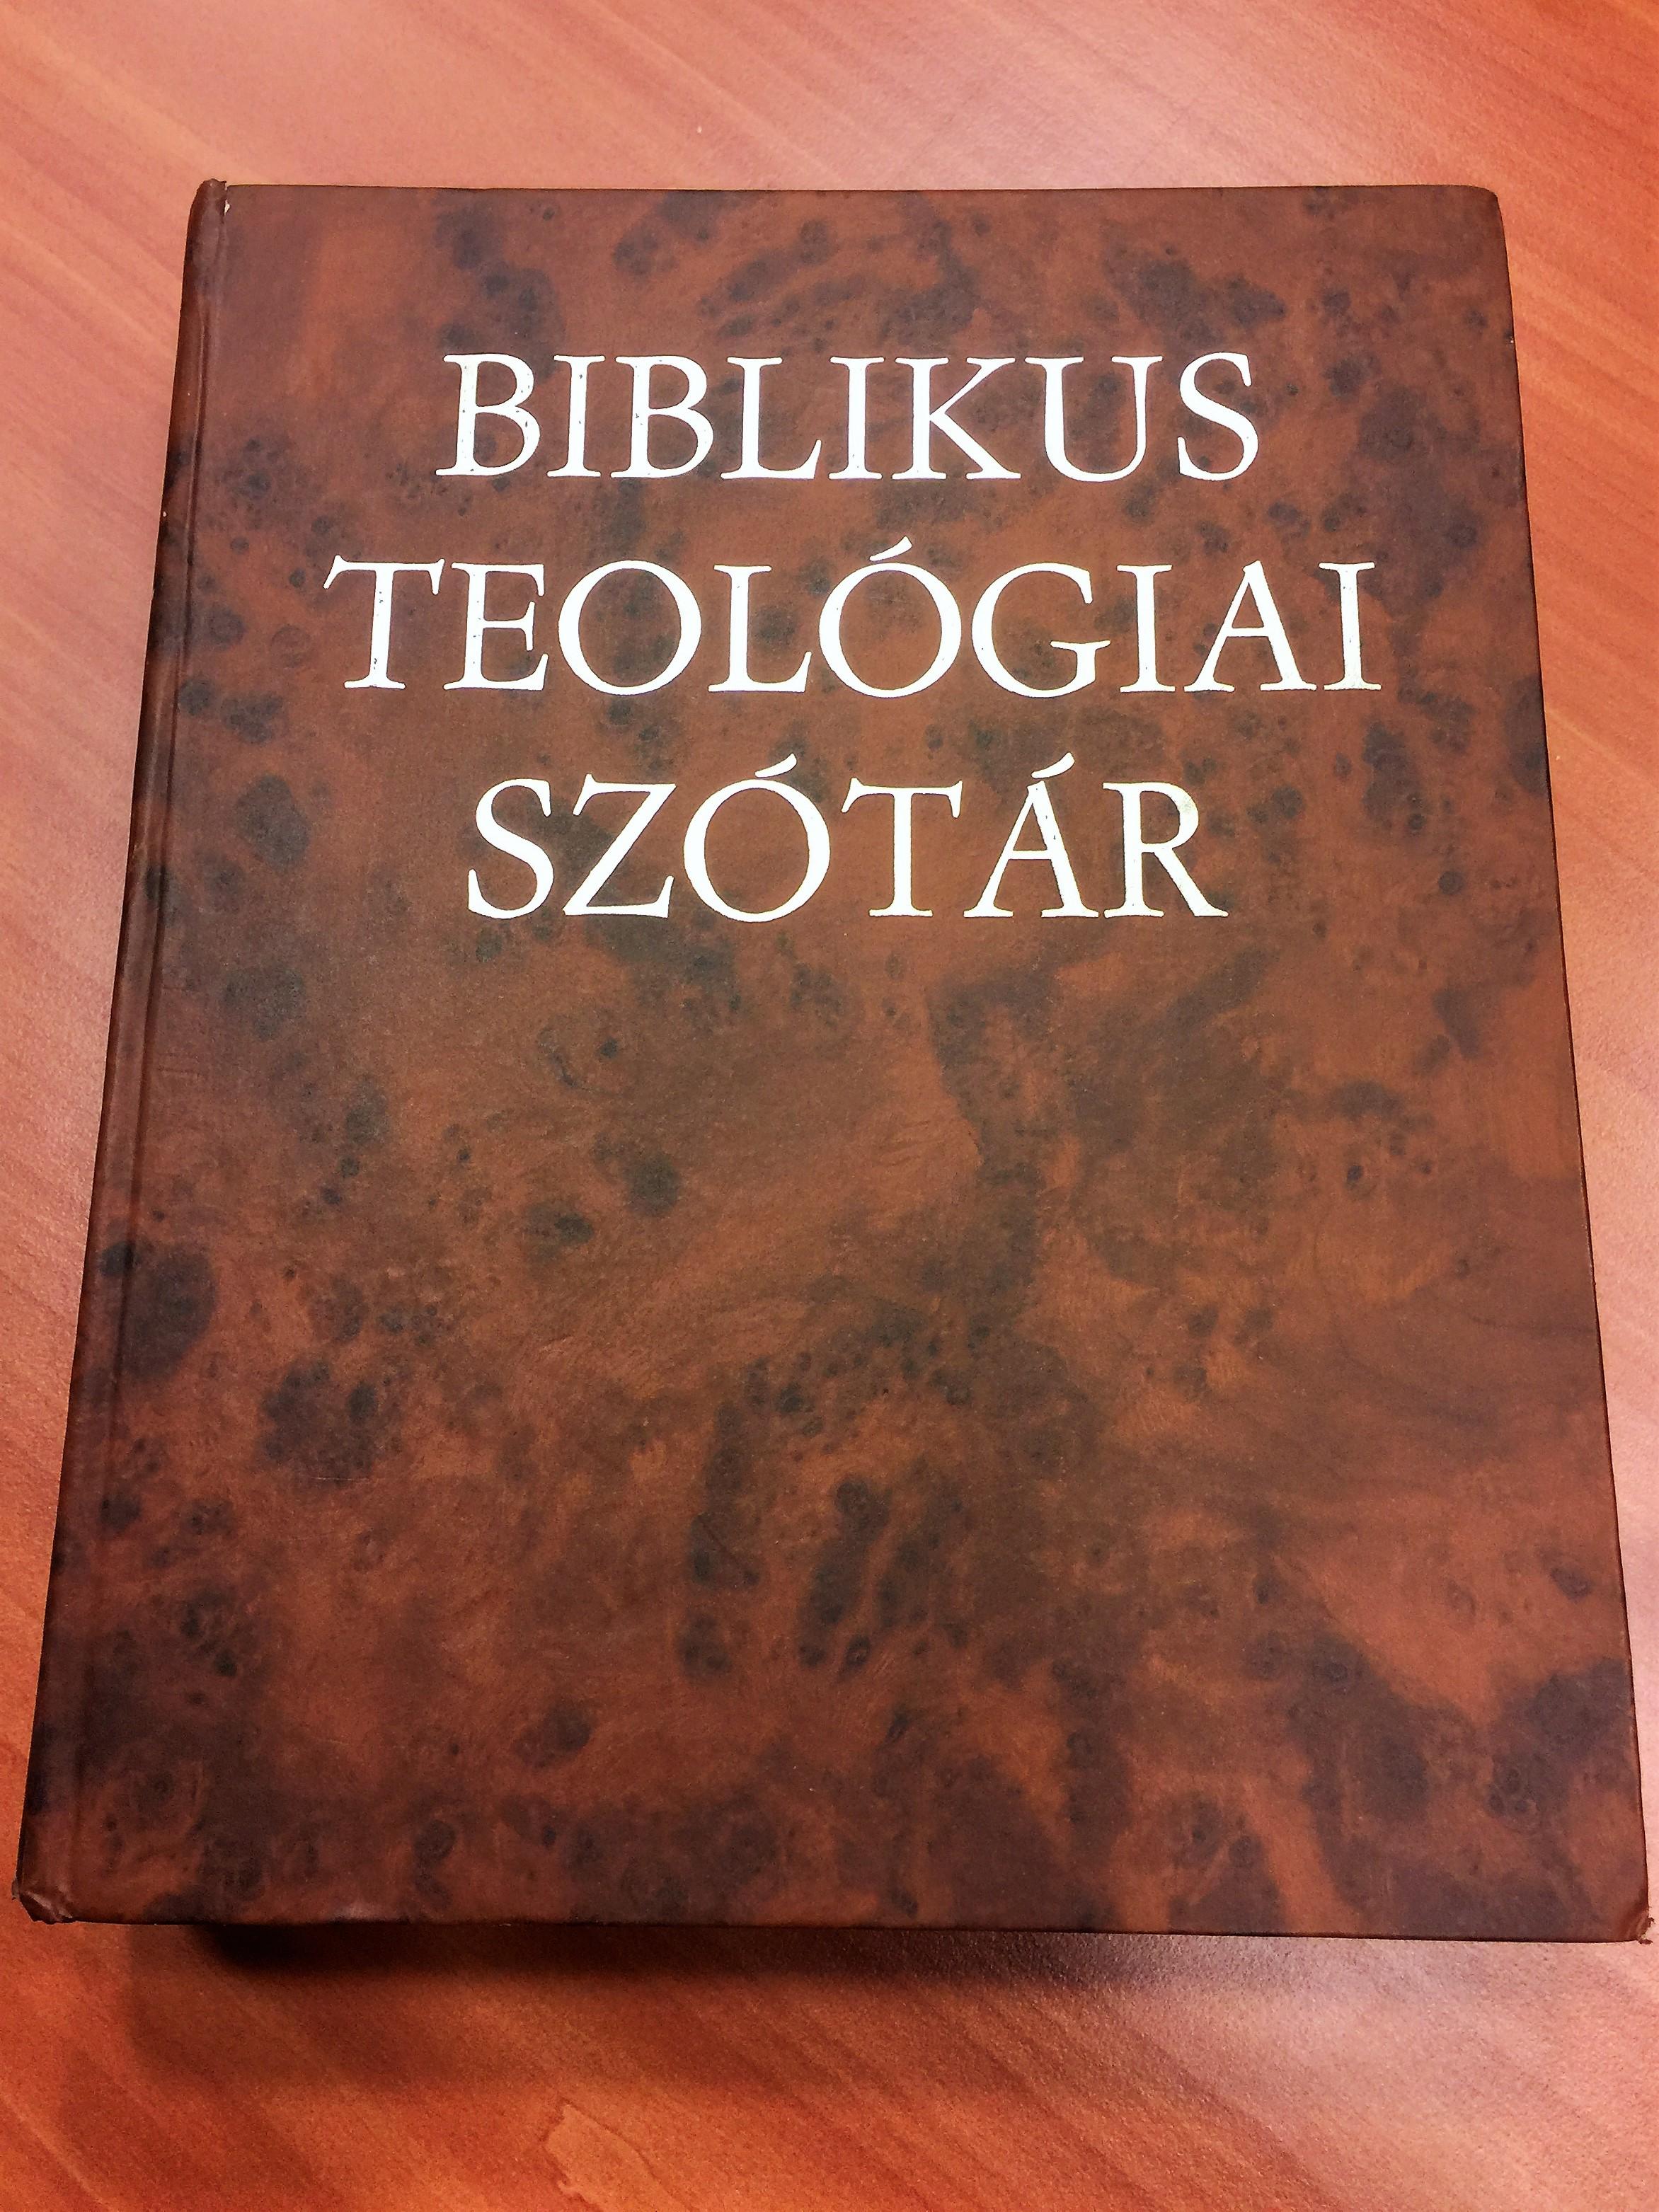 biblikus-teol-giai-sz-t-r-biblical-theology-dictionary-vocabulaire-de-th-ologie-biblique-szent-istv-n-t-rsulat-hardcover-1992-1-.jpg